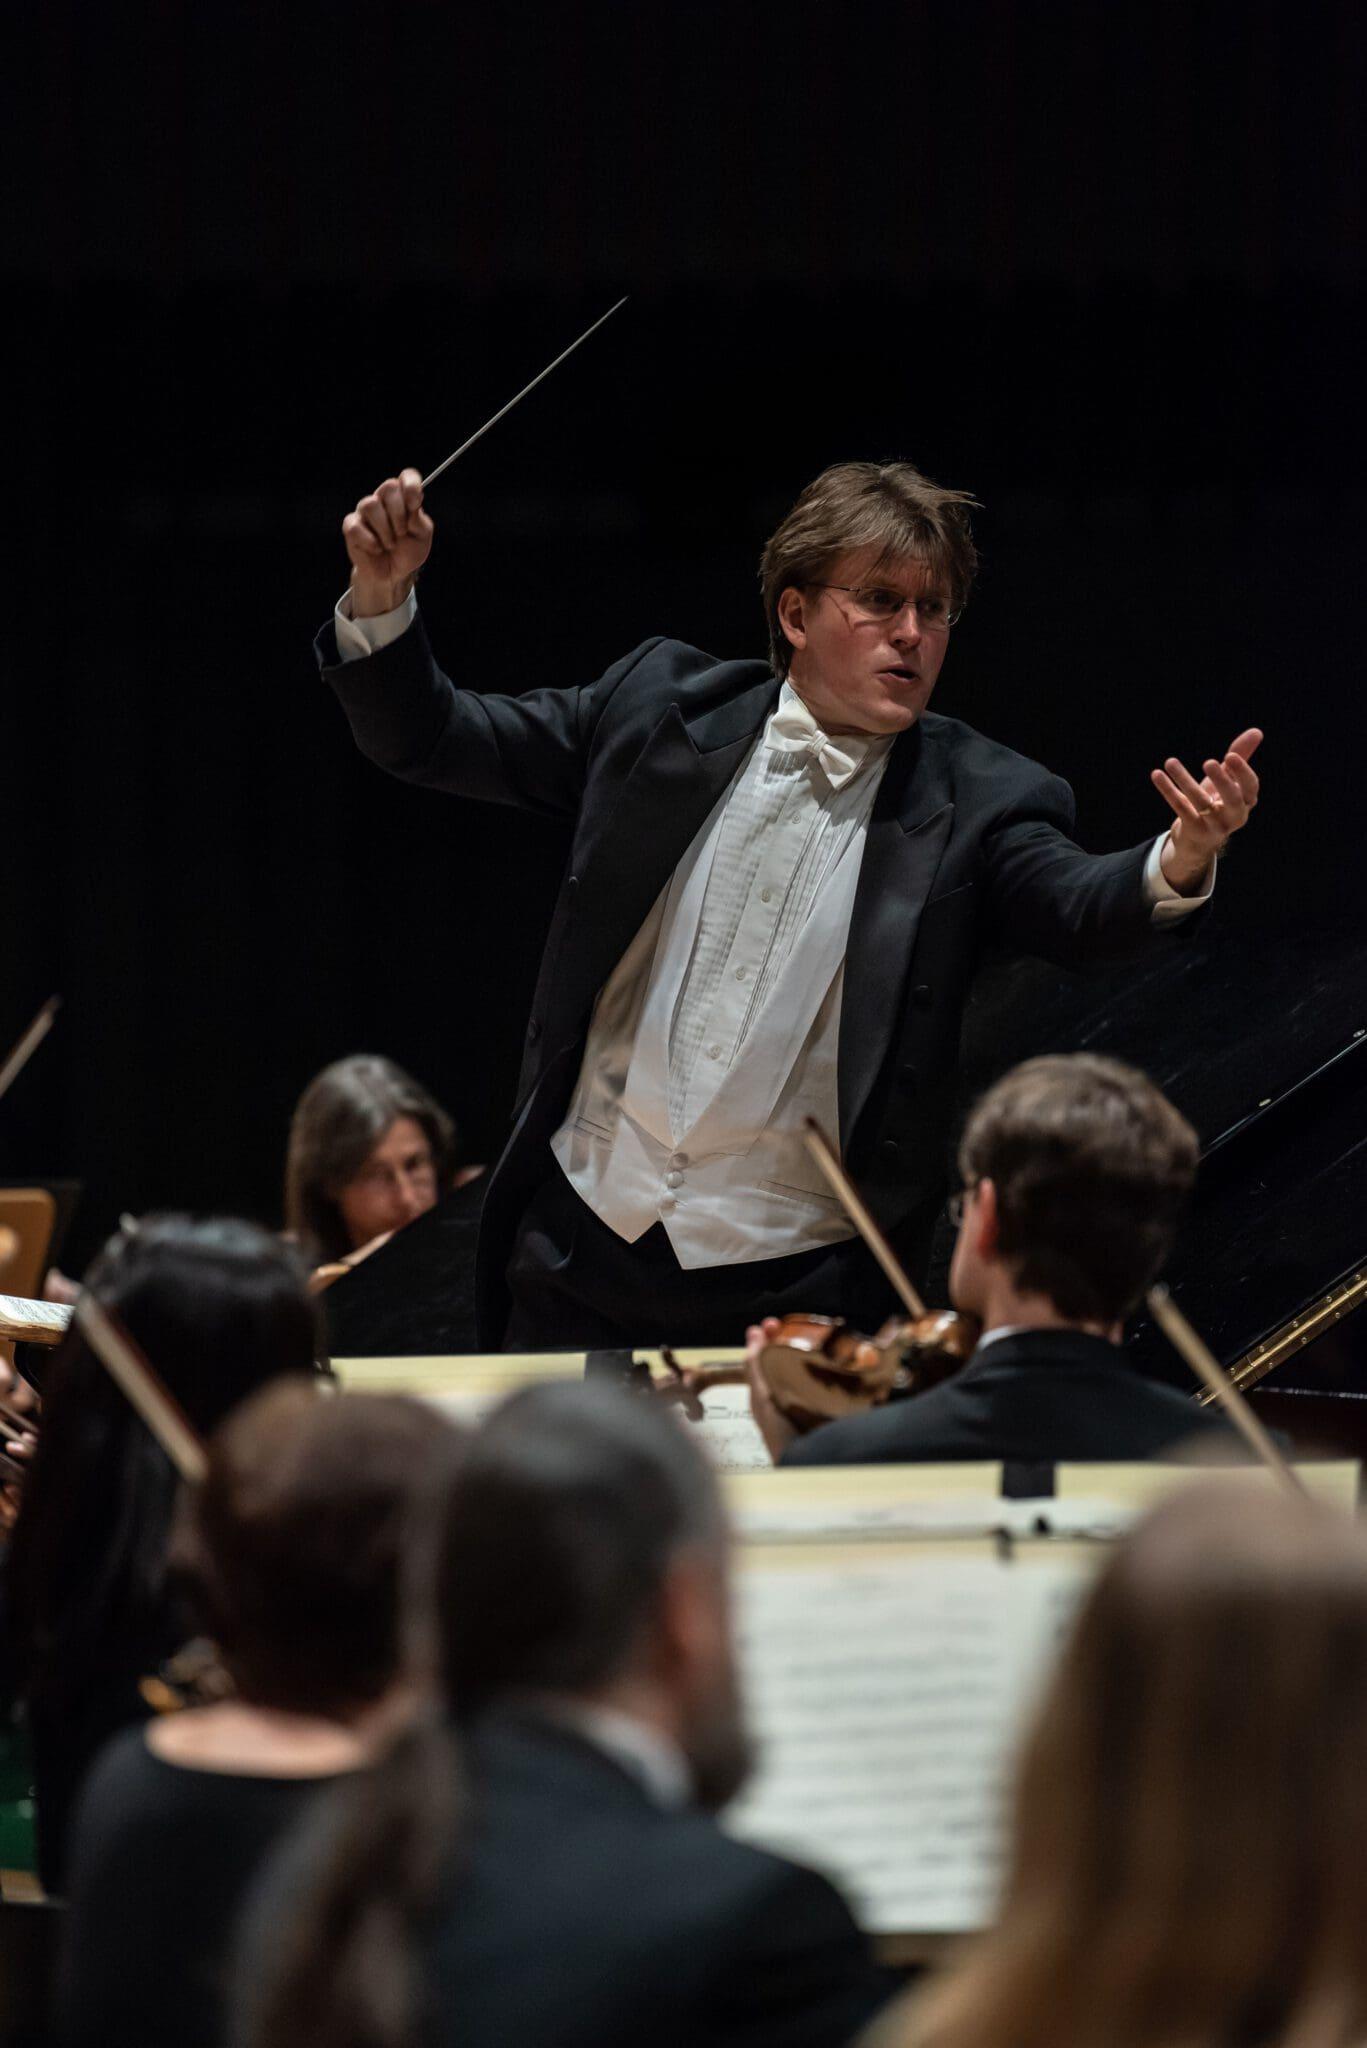 Joseph Trafton, Generalmusikdirektor am Theater Hagen - Foto Leszek Januszewski